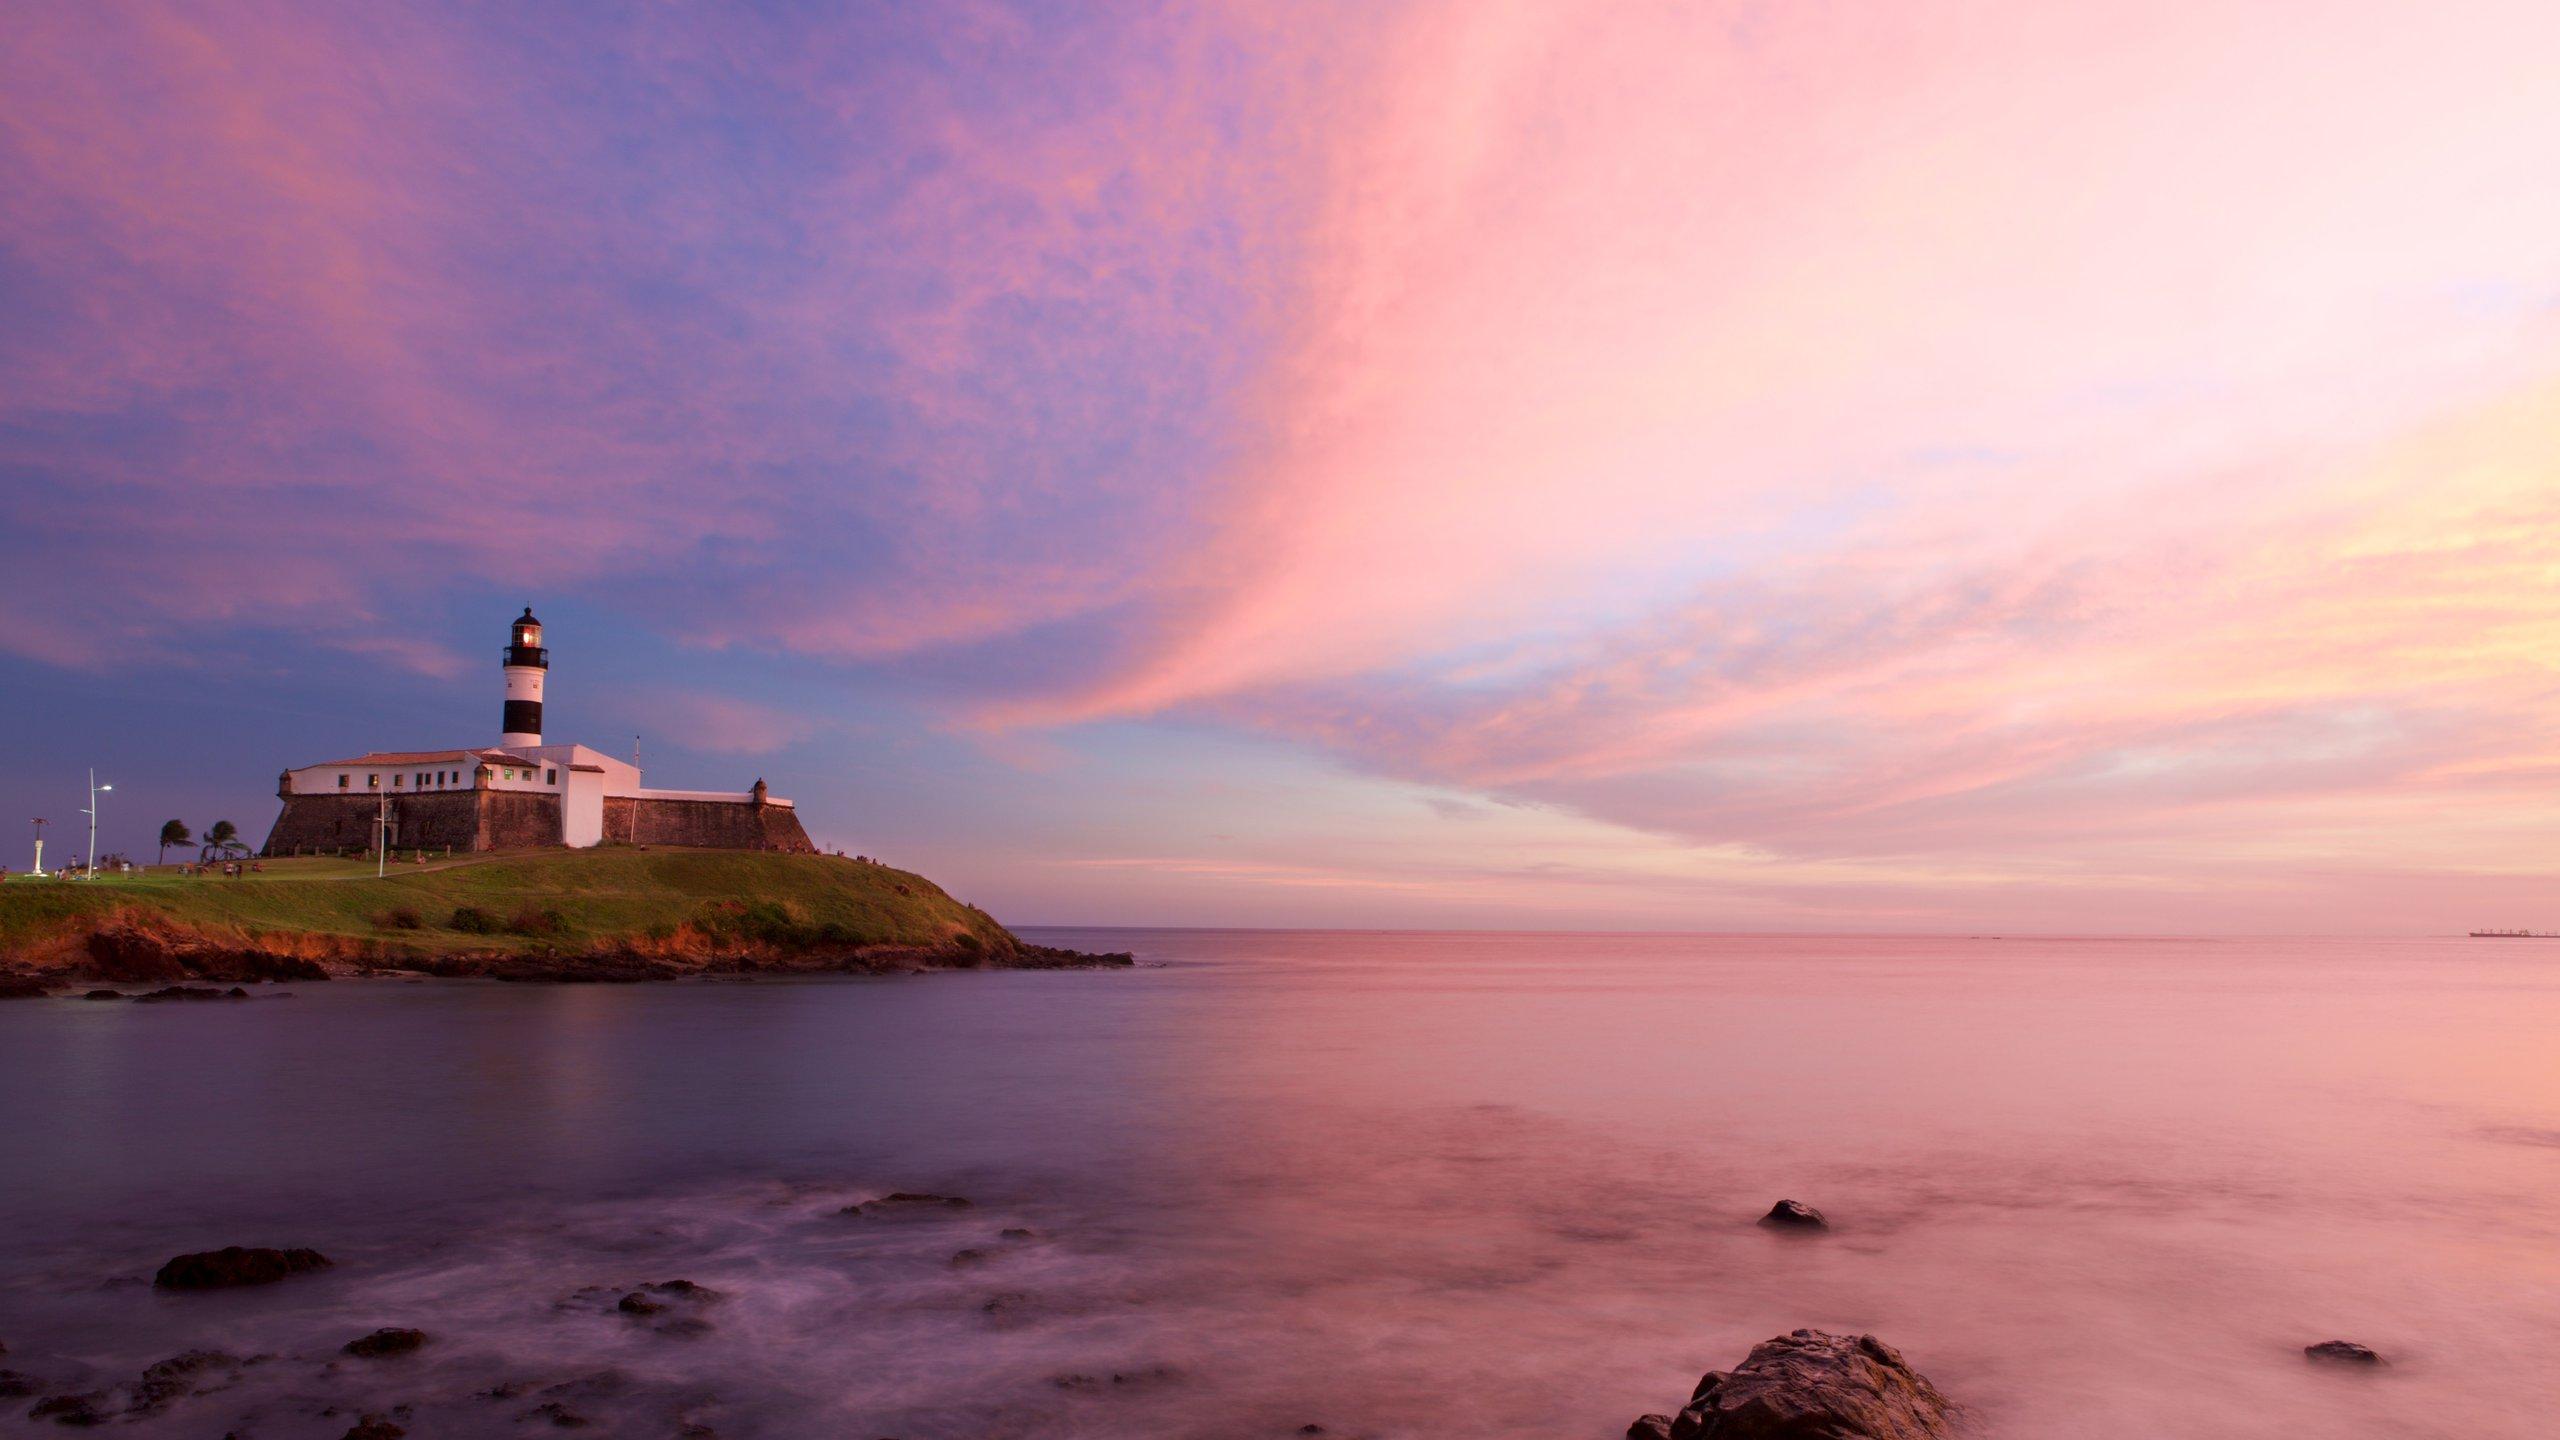 Farol da Barra Beach which includes general coastal views, a lighthouse and a sunset